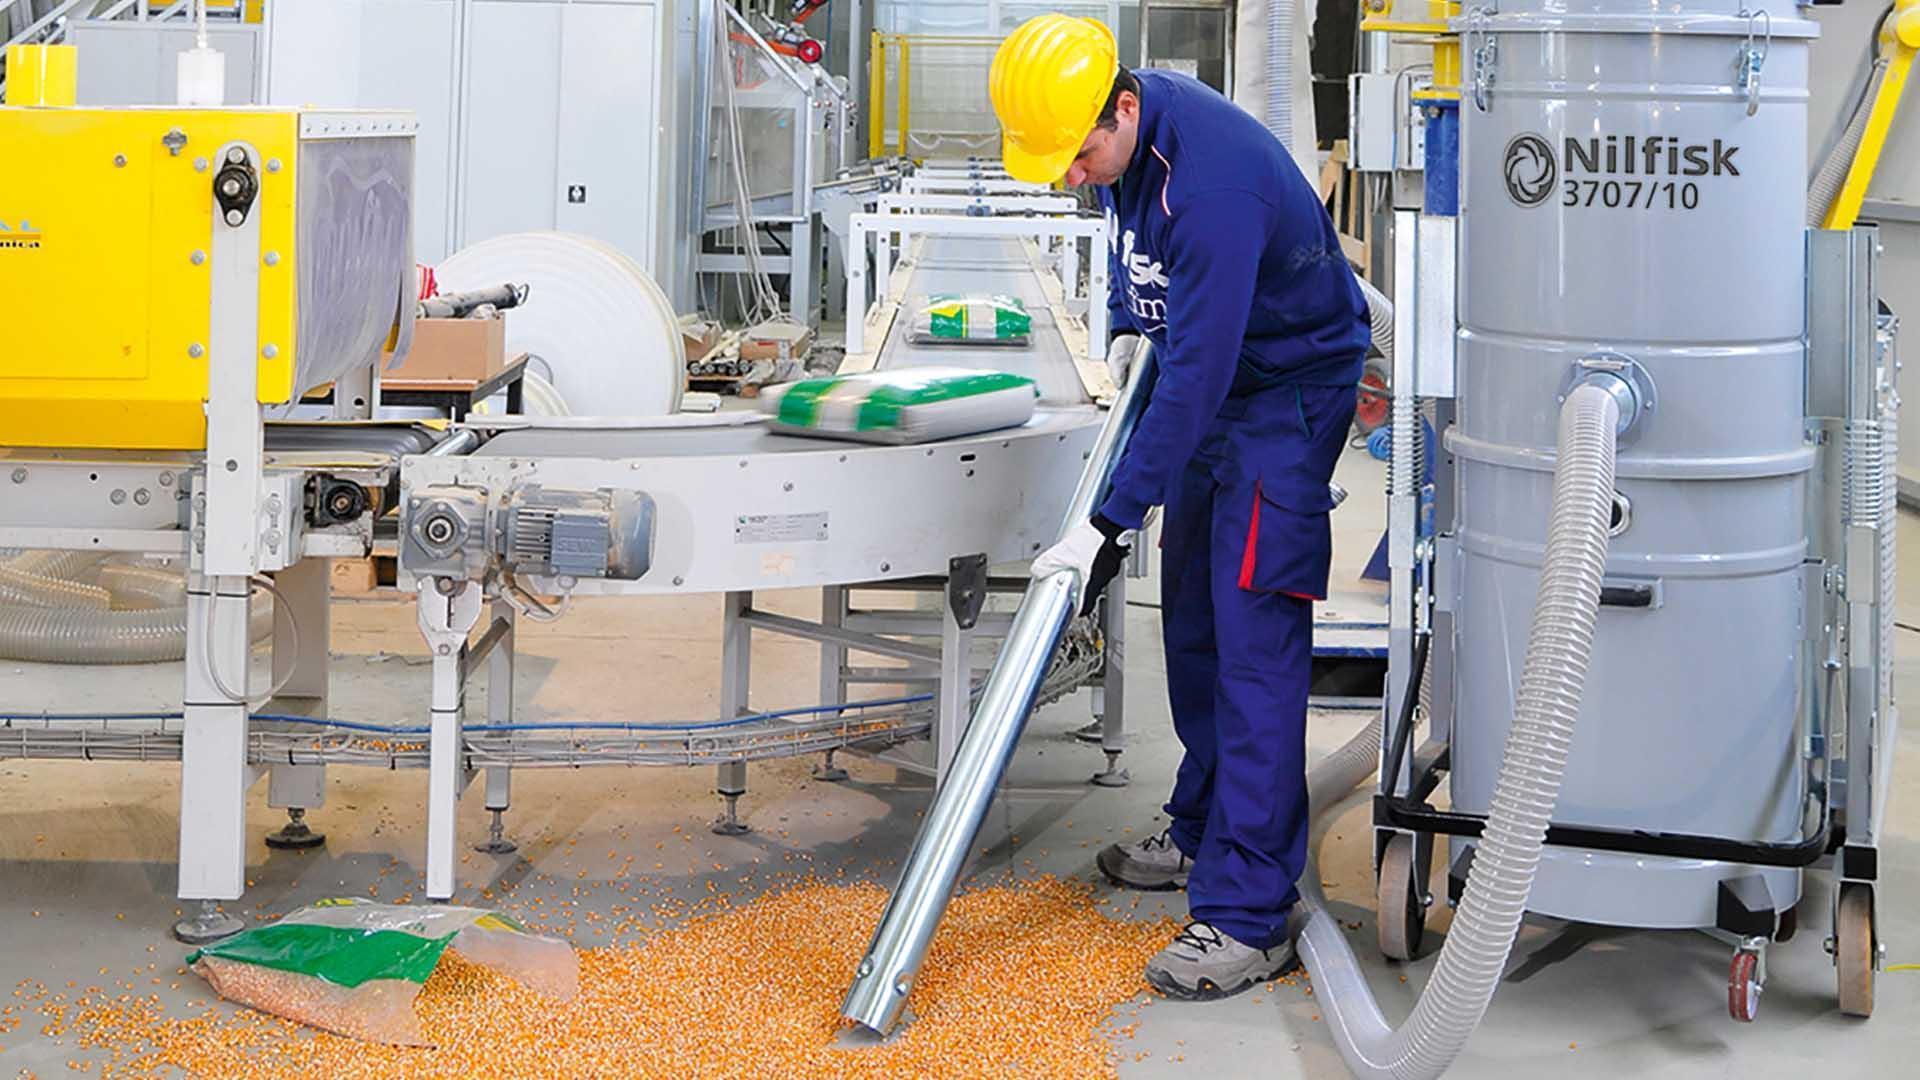 man vacuuming in industrial factory